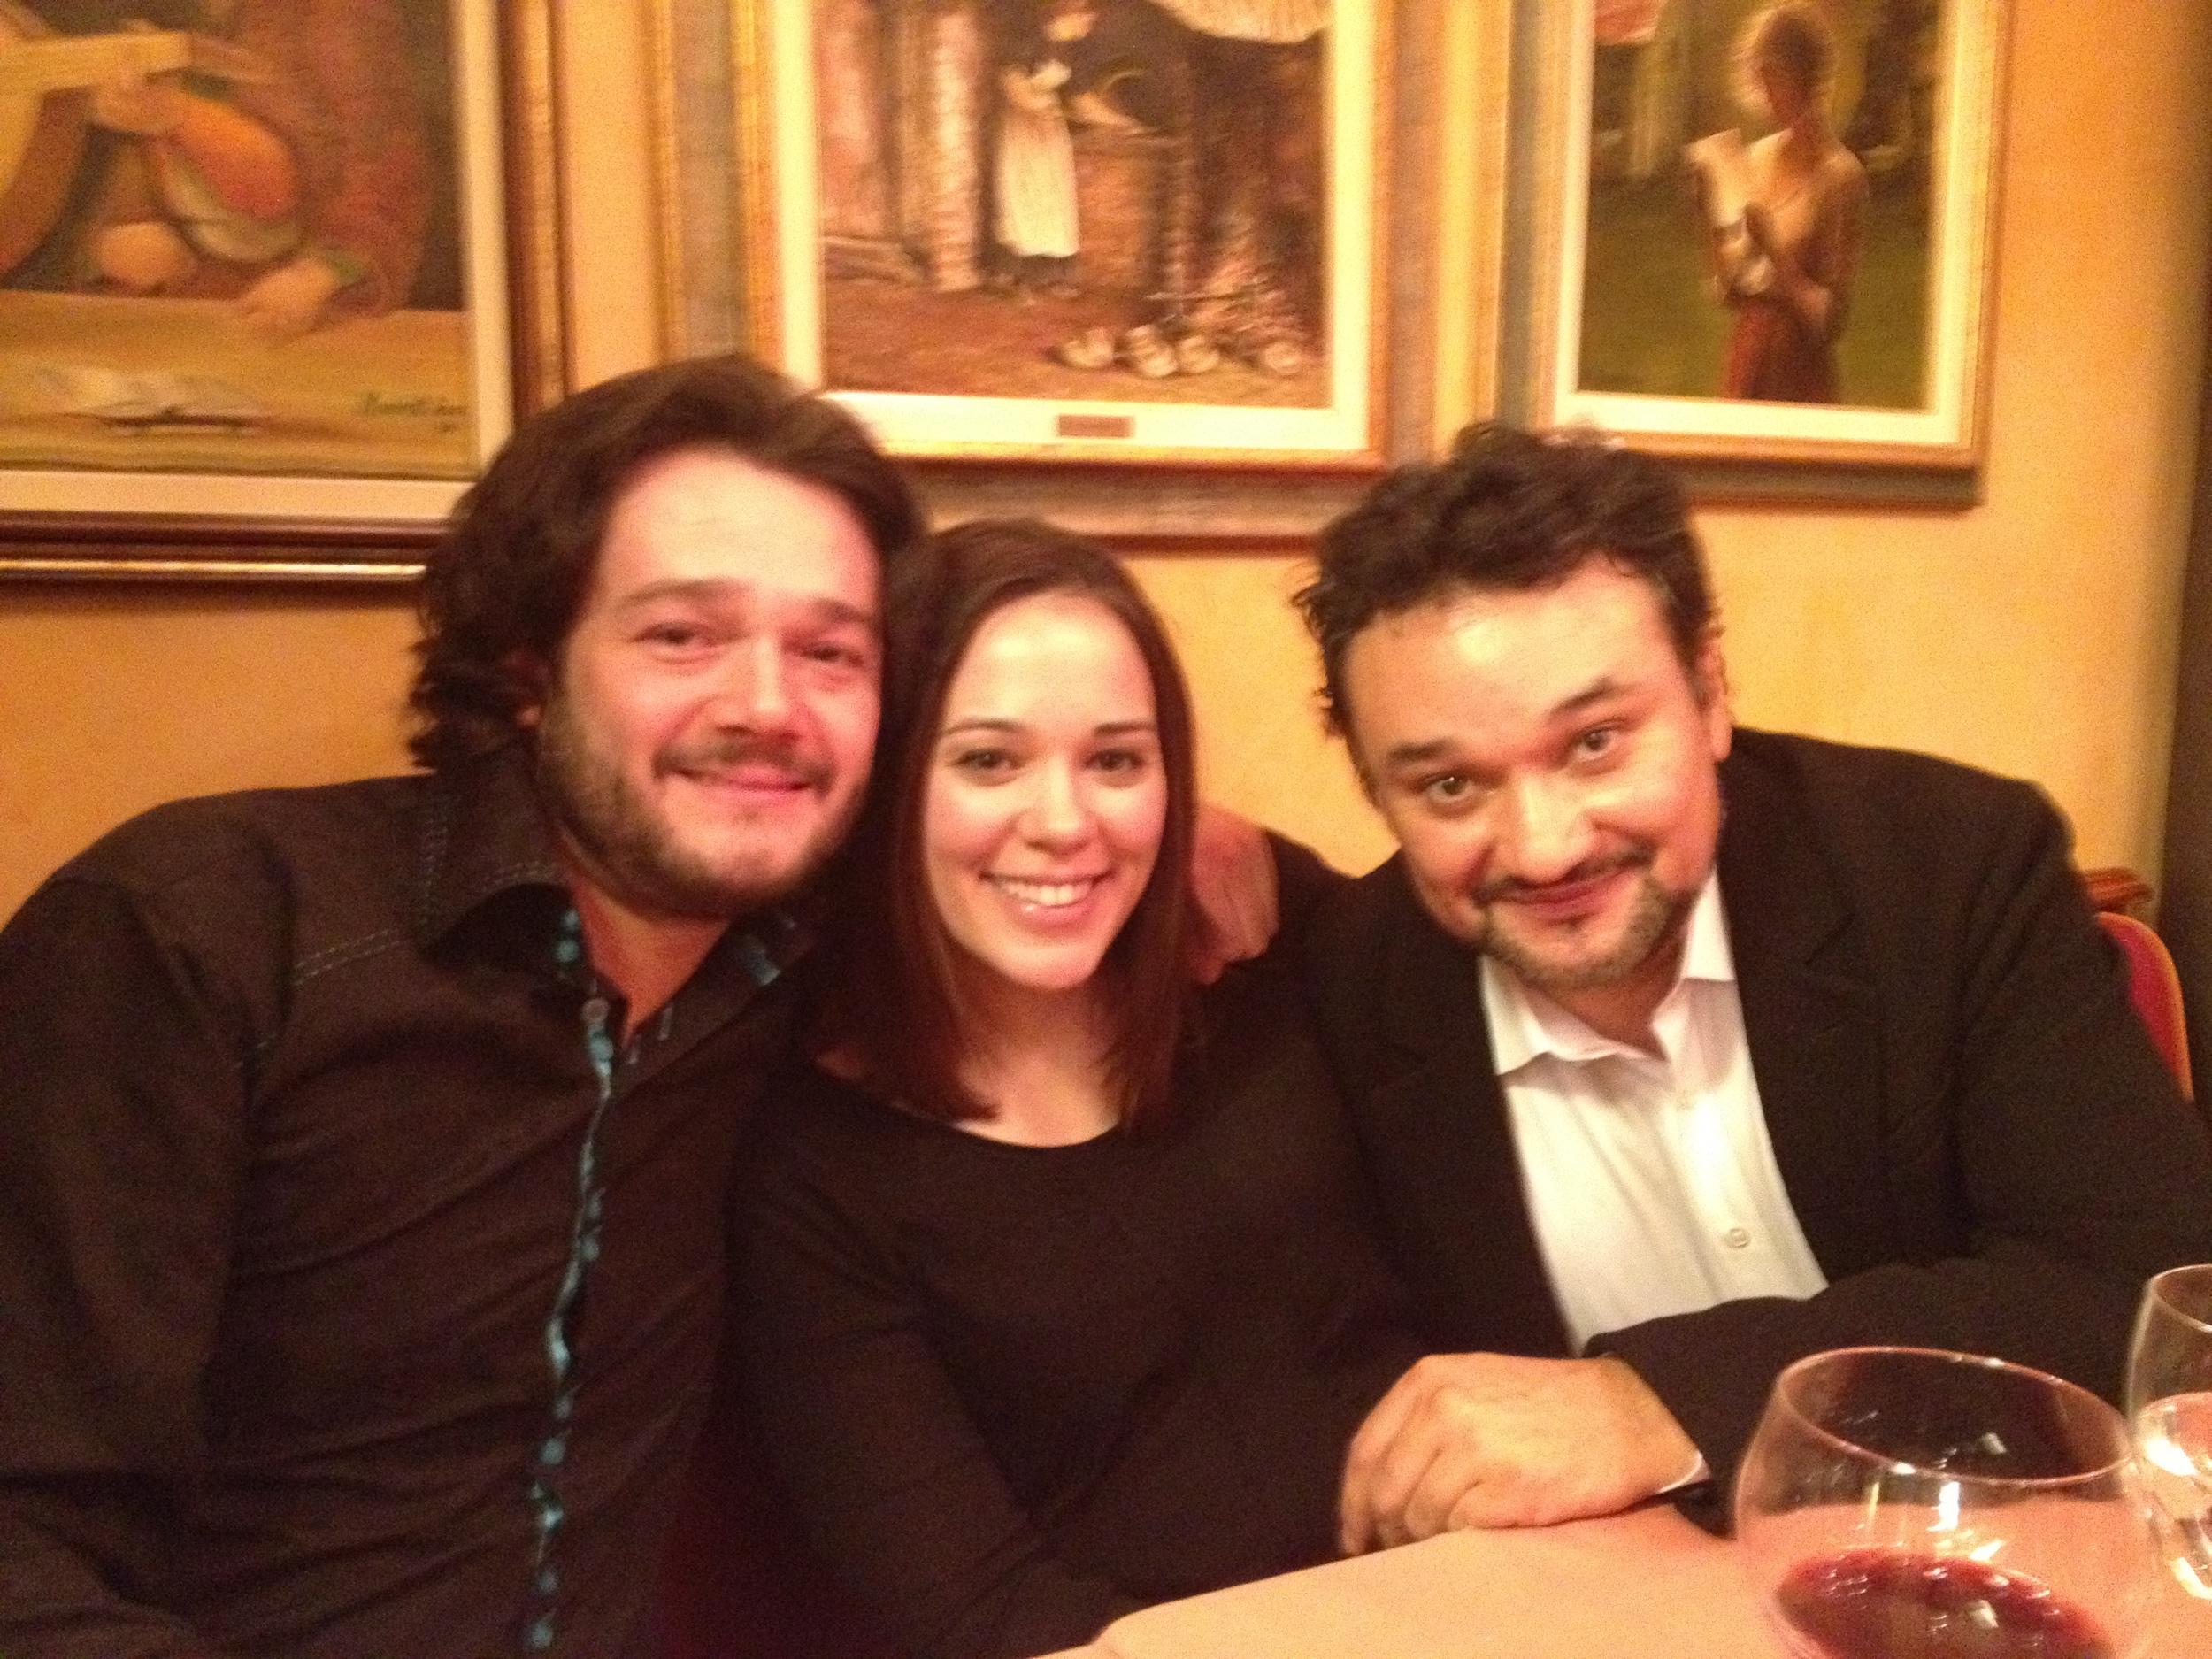 Two of my favorite tenors, Arturo Chacón-Cruz and Ramón Vargas